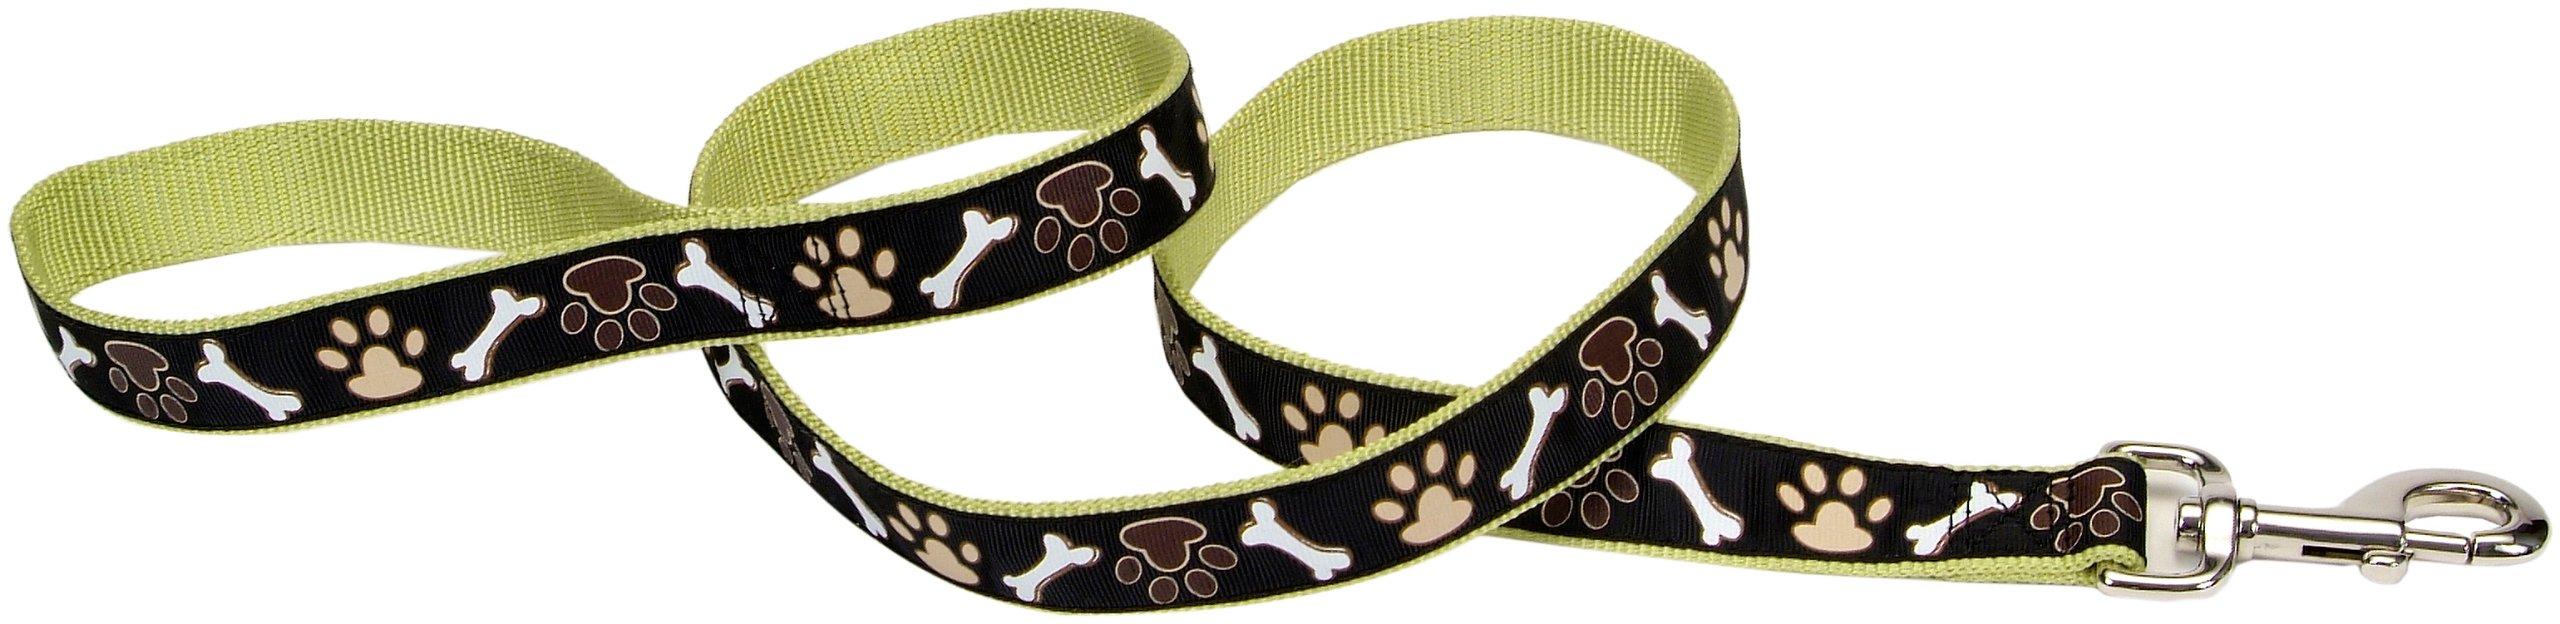 Pet Attire® Ribbon Nylon Leash, 5/8 x 6'